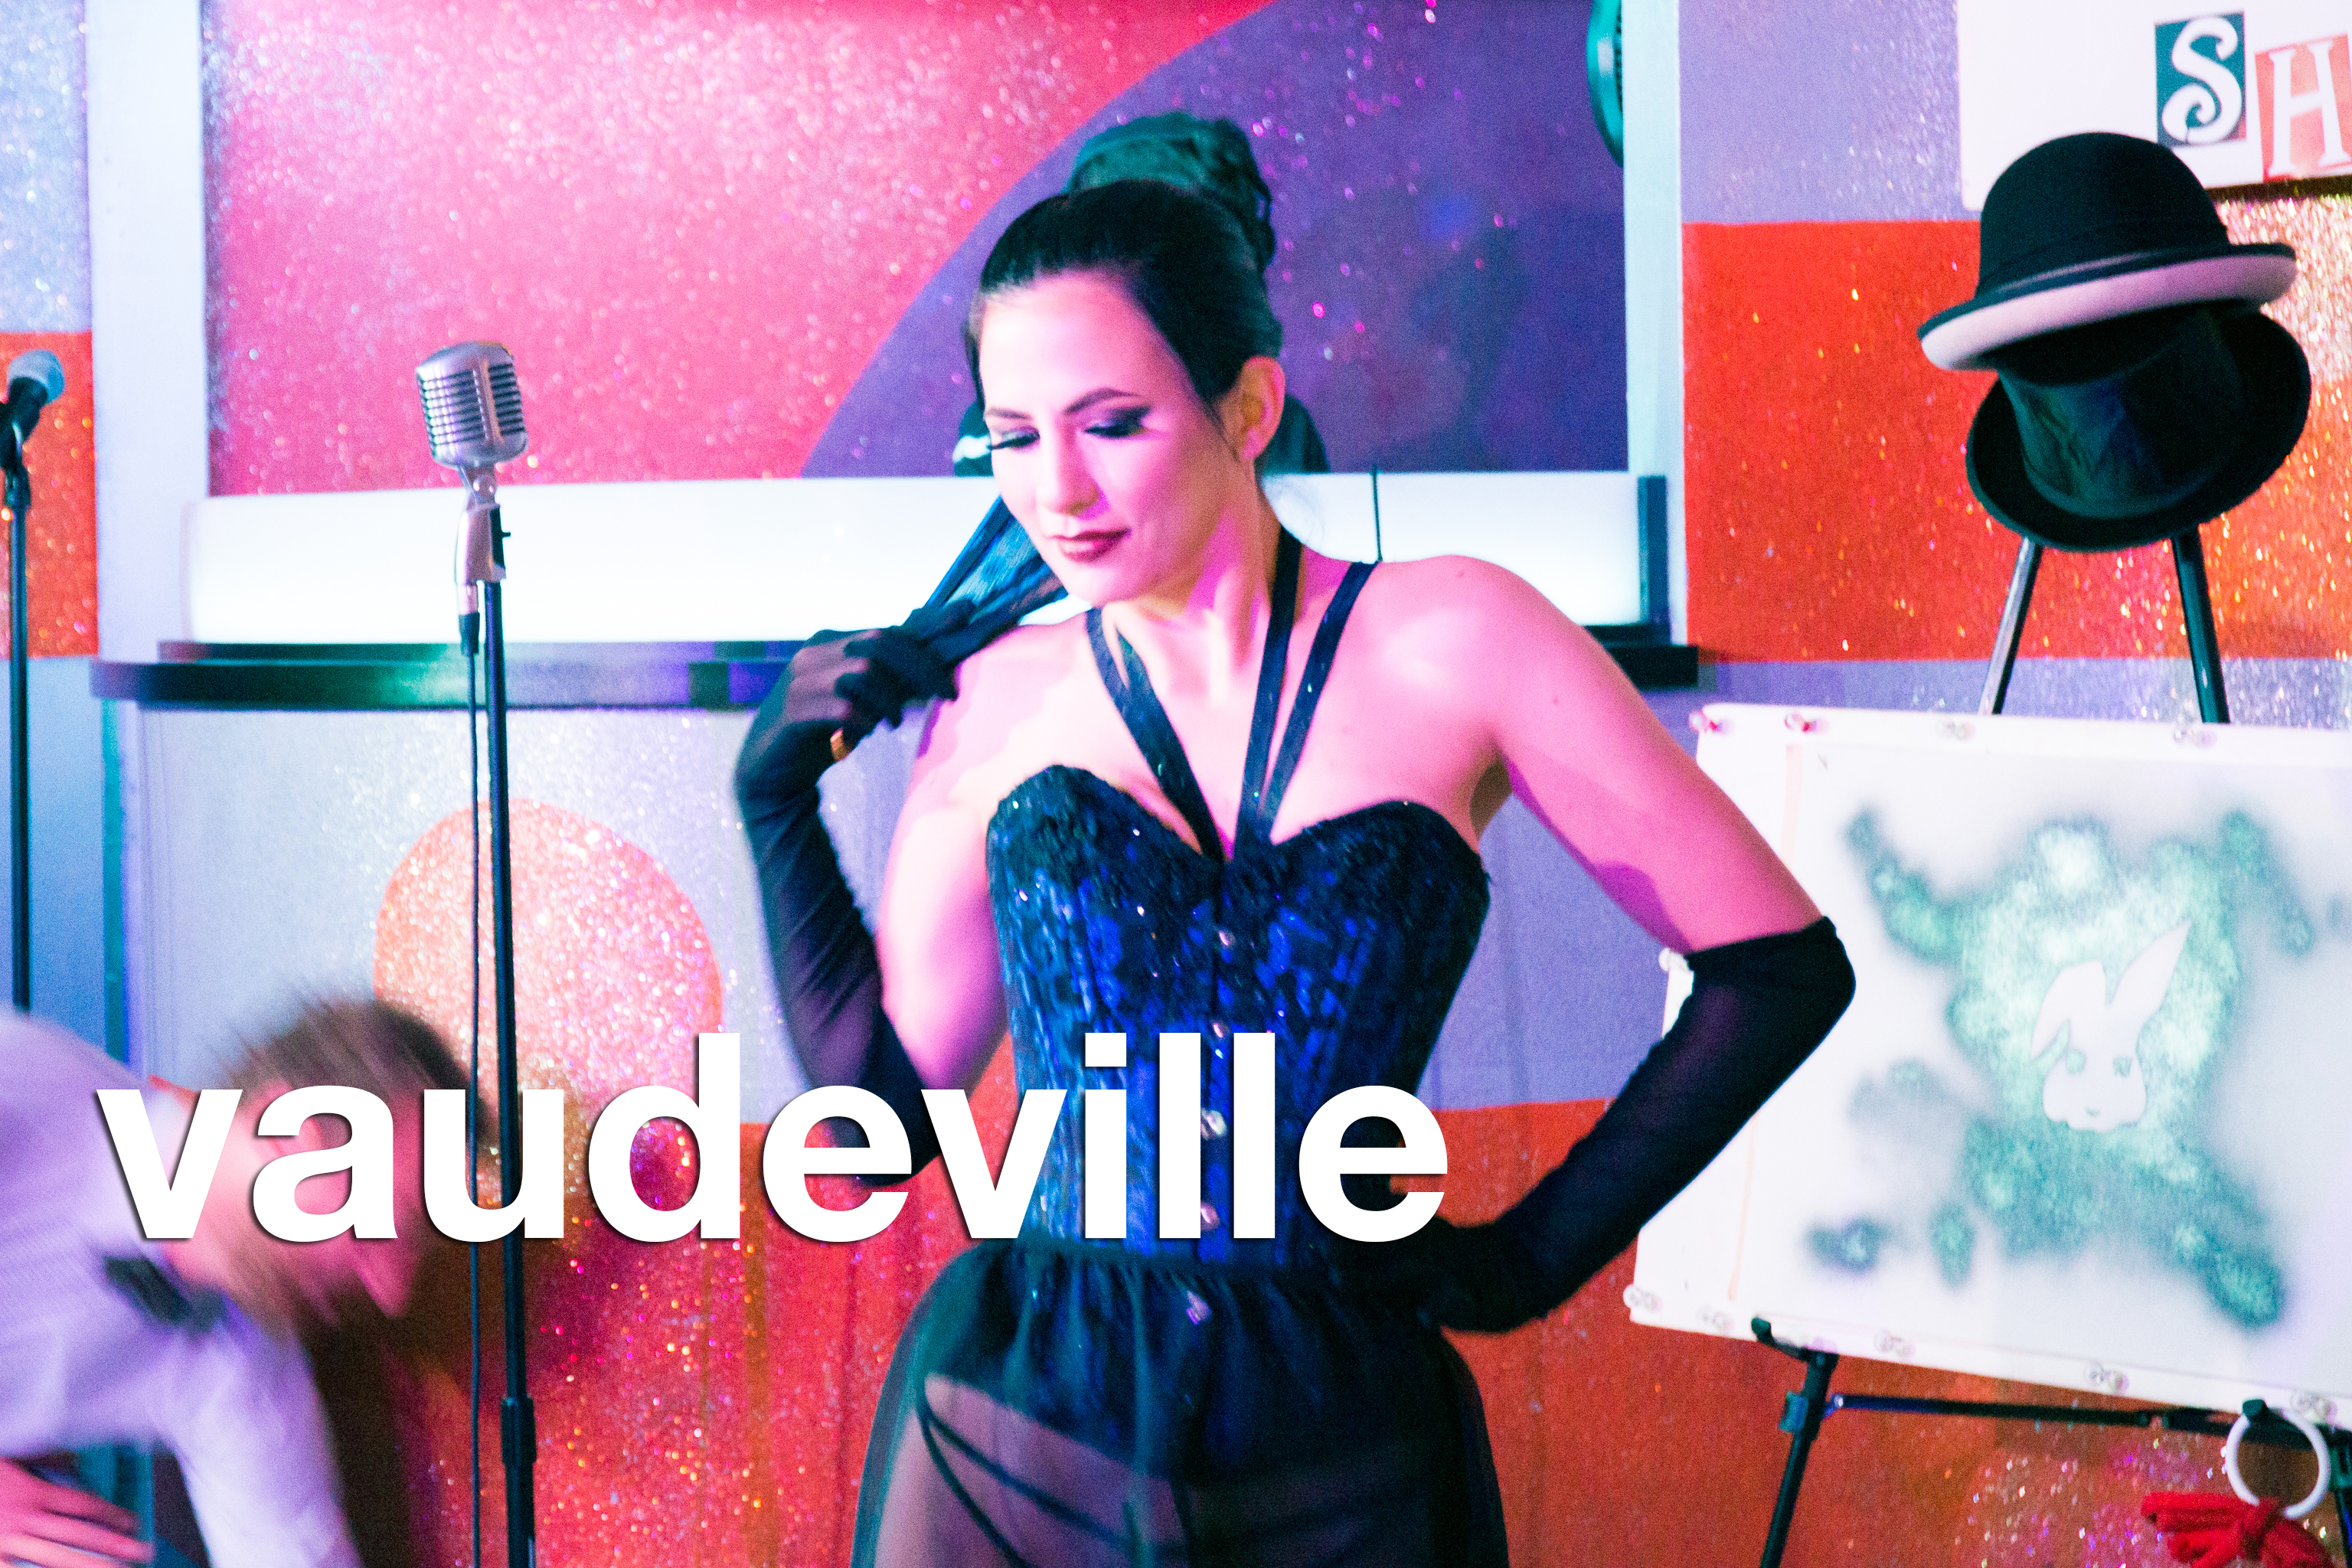 glitterguts event pics from vaudeville at beauty bar chicago, july 2018